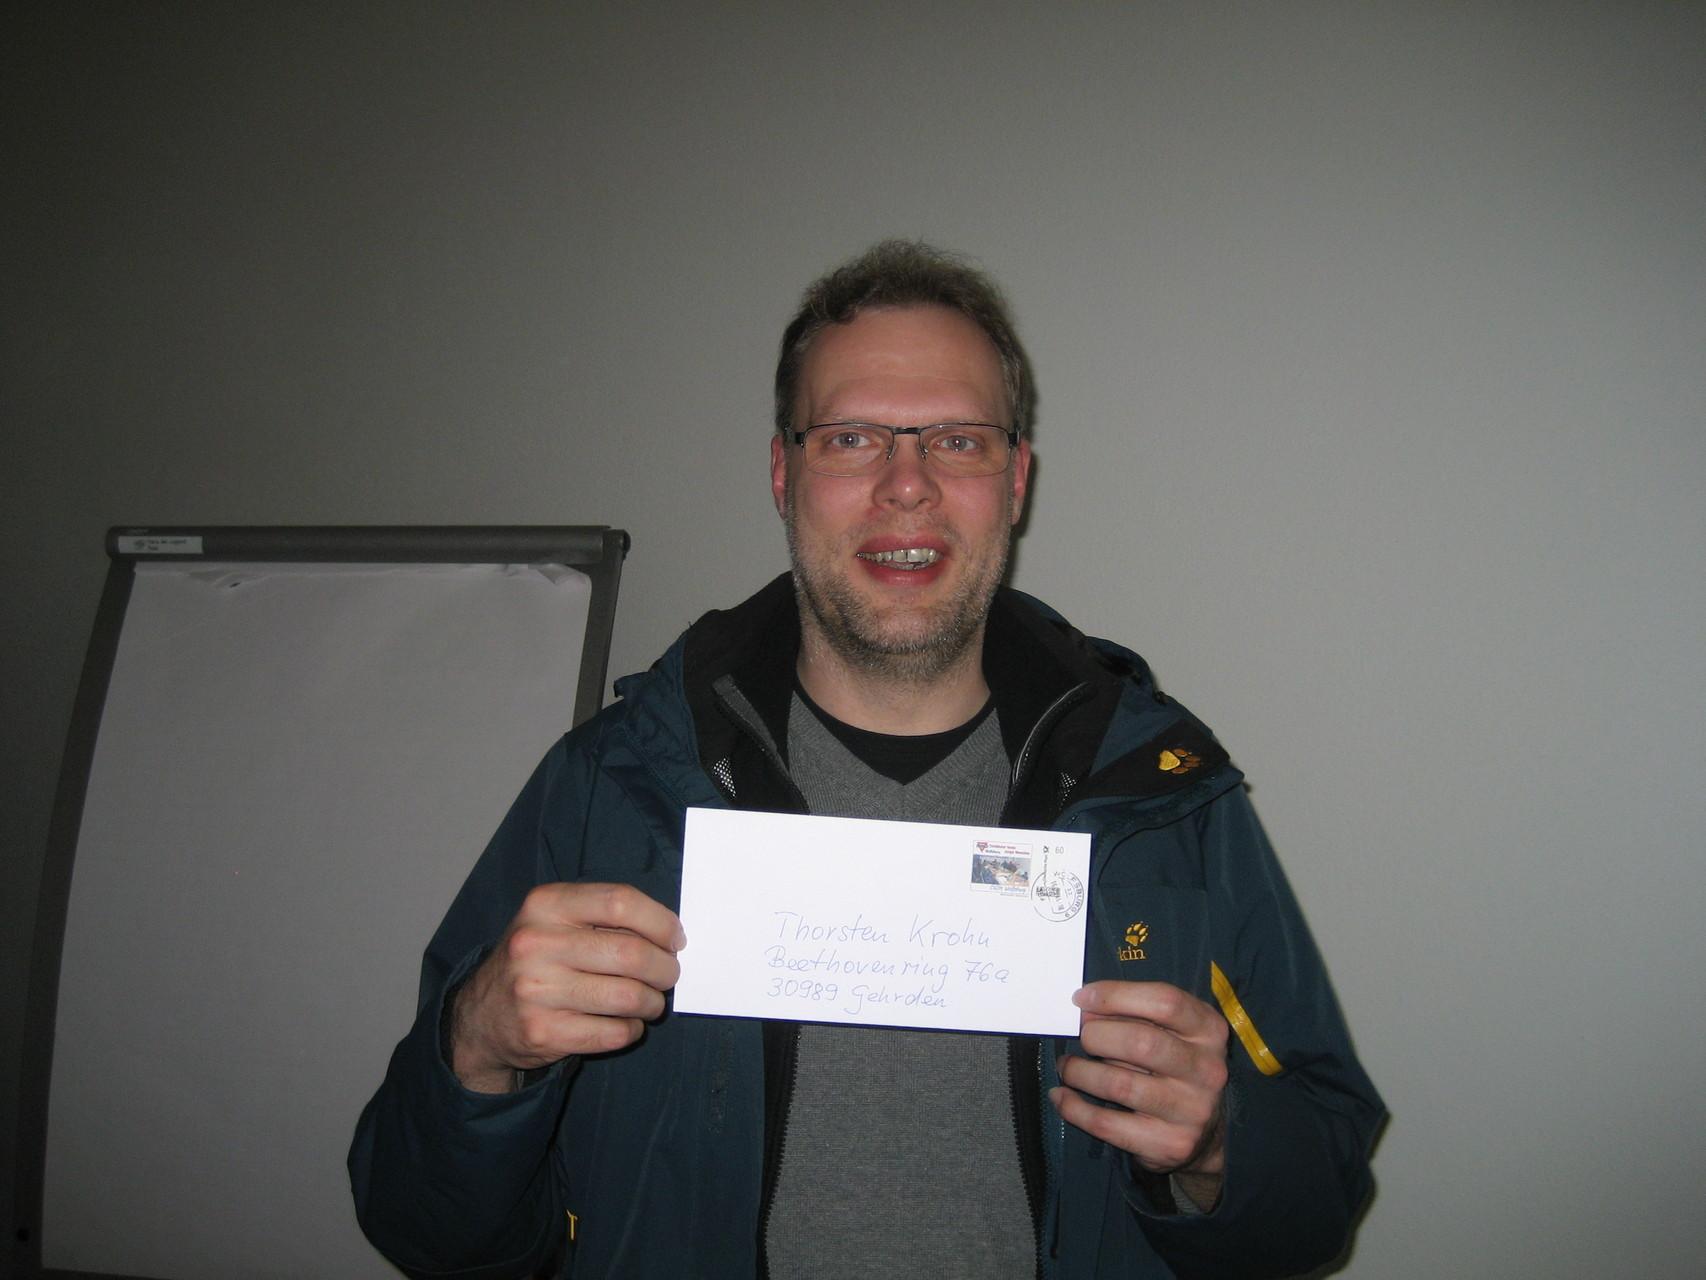 Andreas Krohn vom CVJM Landesverband Hannover